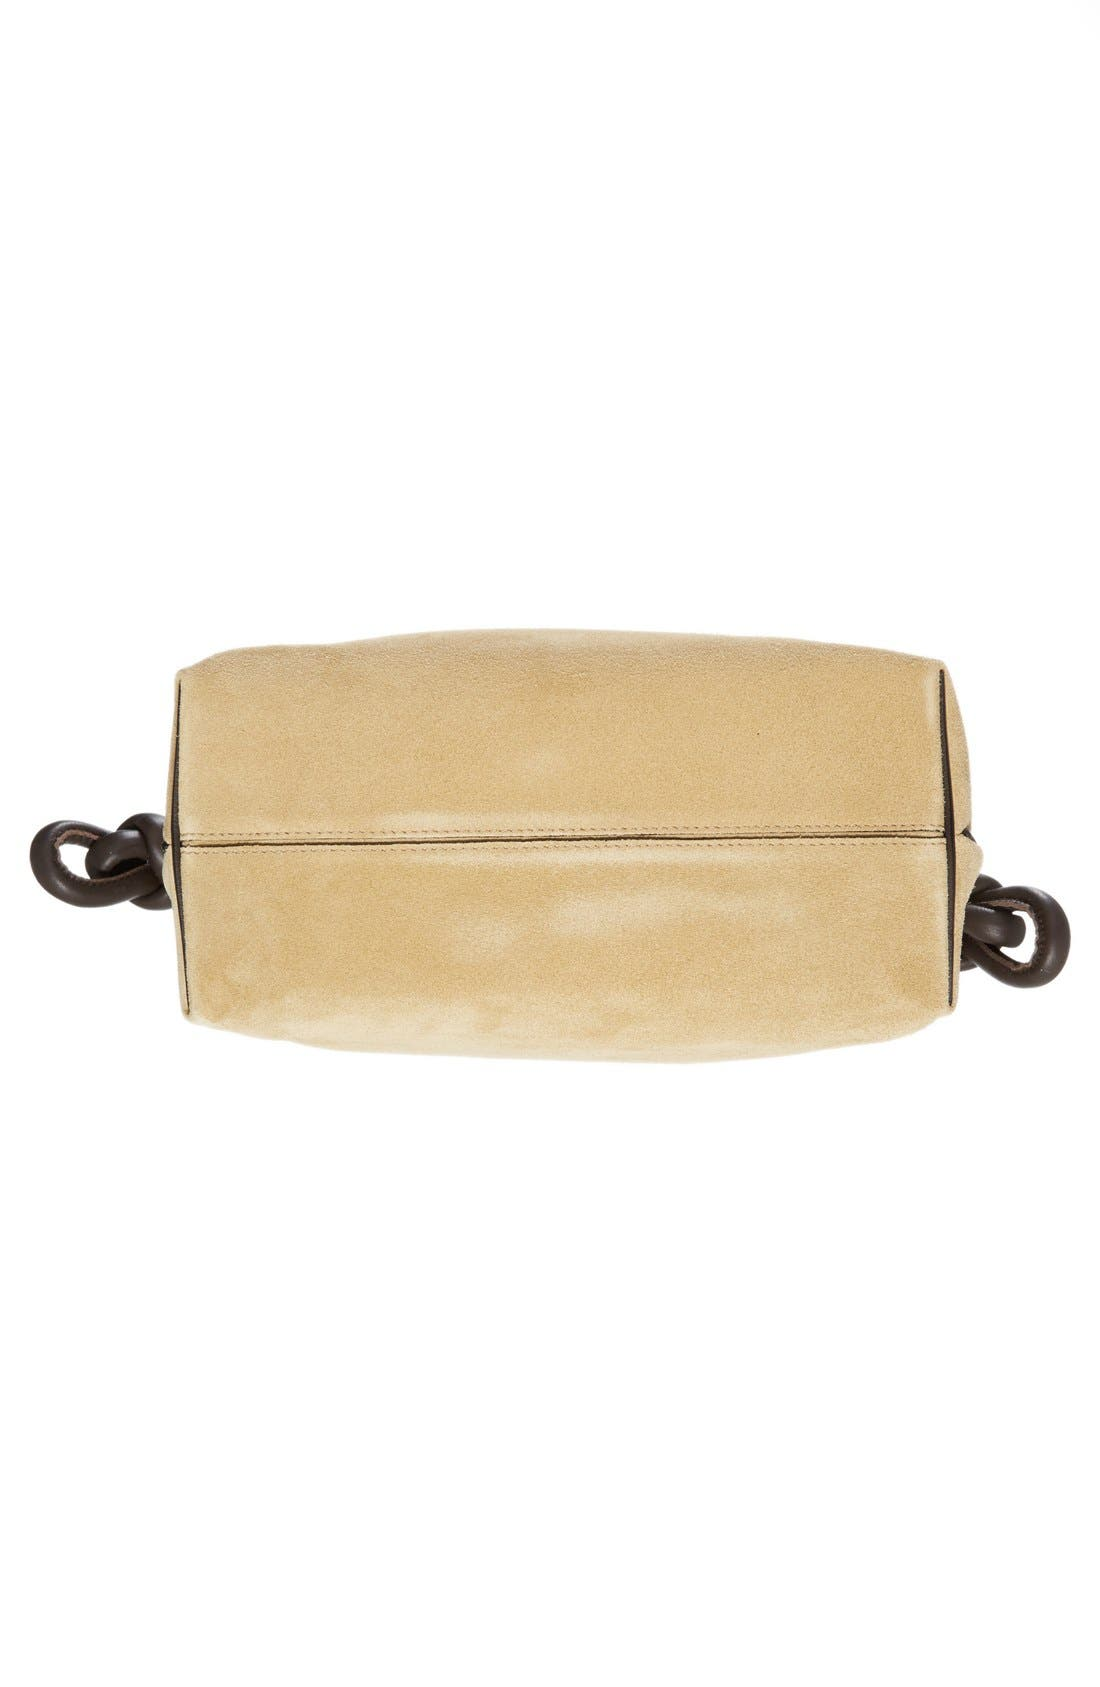 LOEWE, 'Flamenco Knot' Suede & Calfskin Leather Bag, Alternate thumbnail 6, color, 250